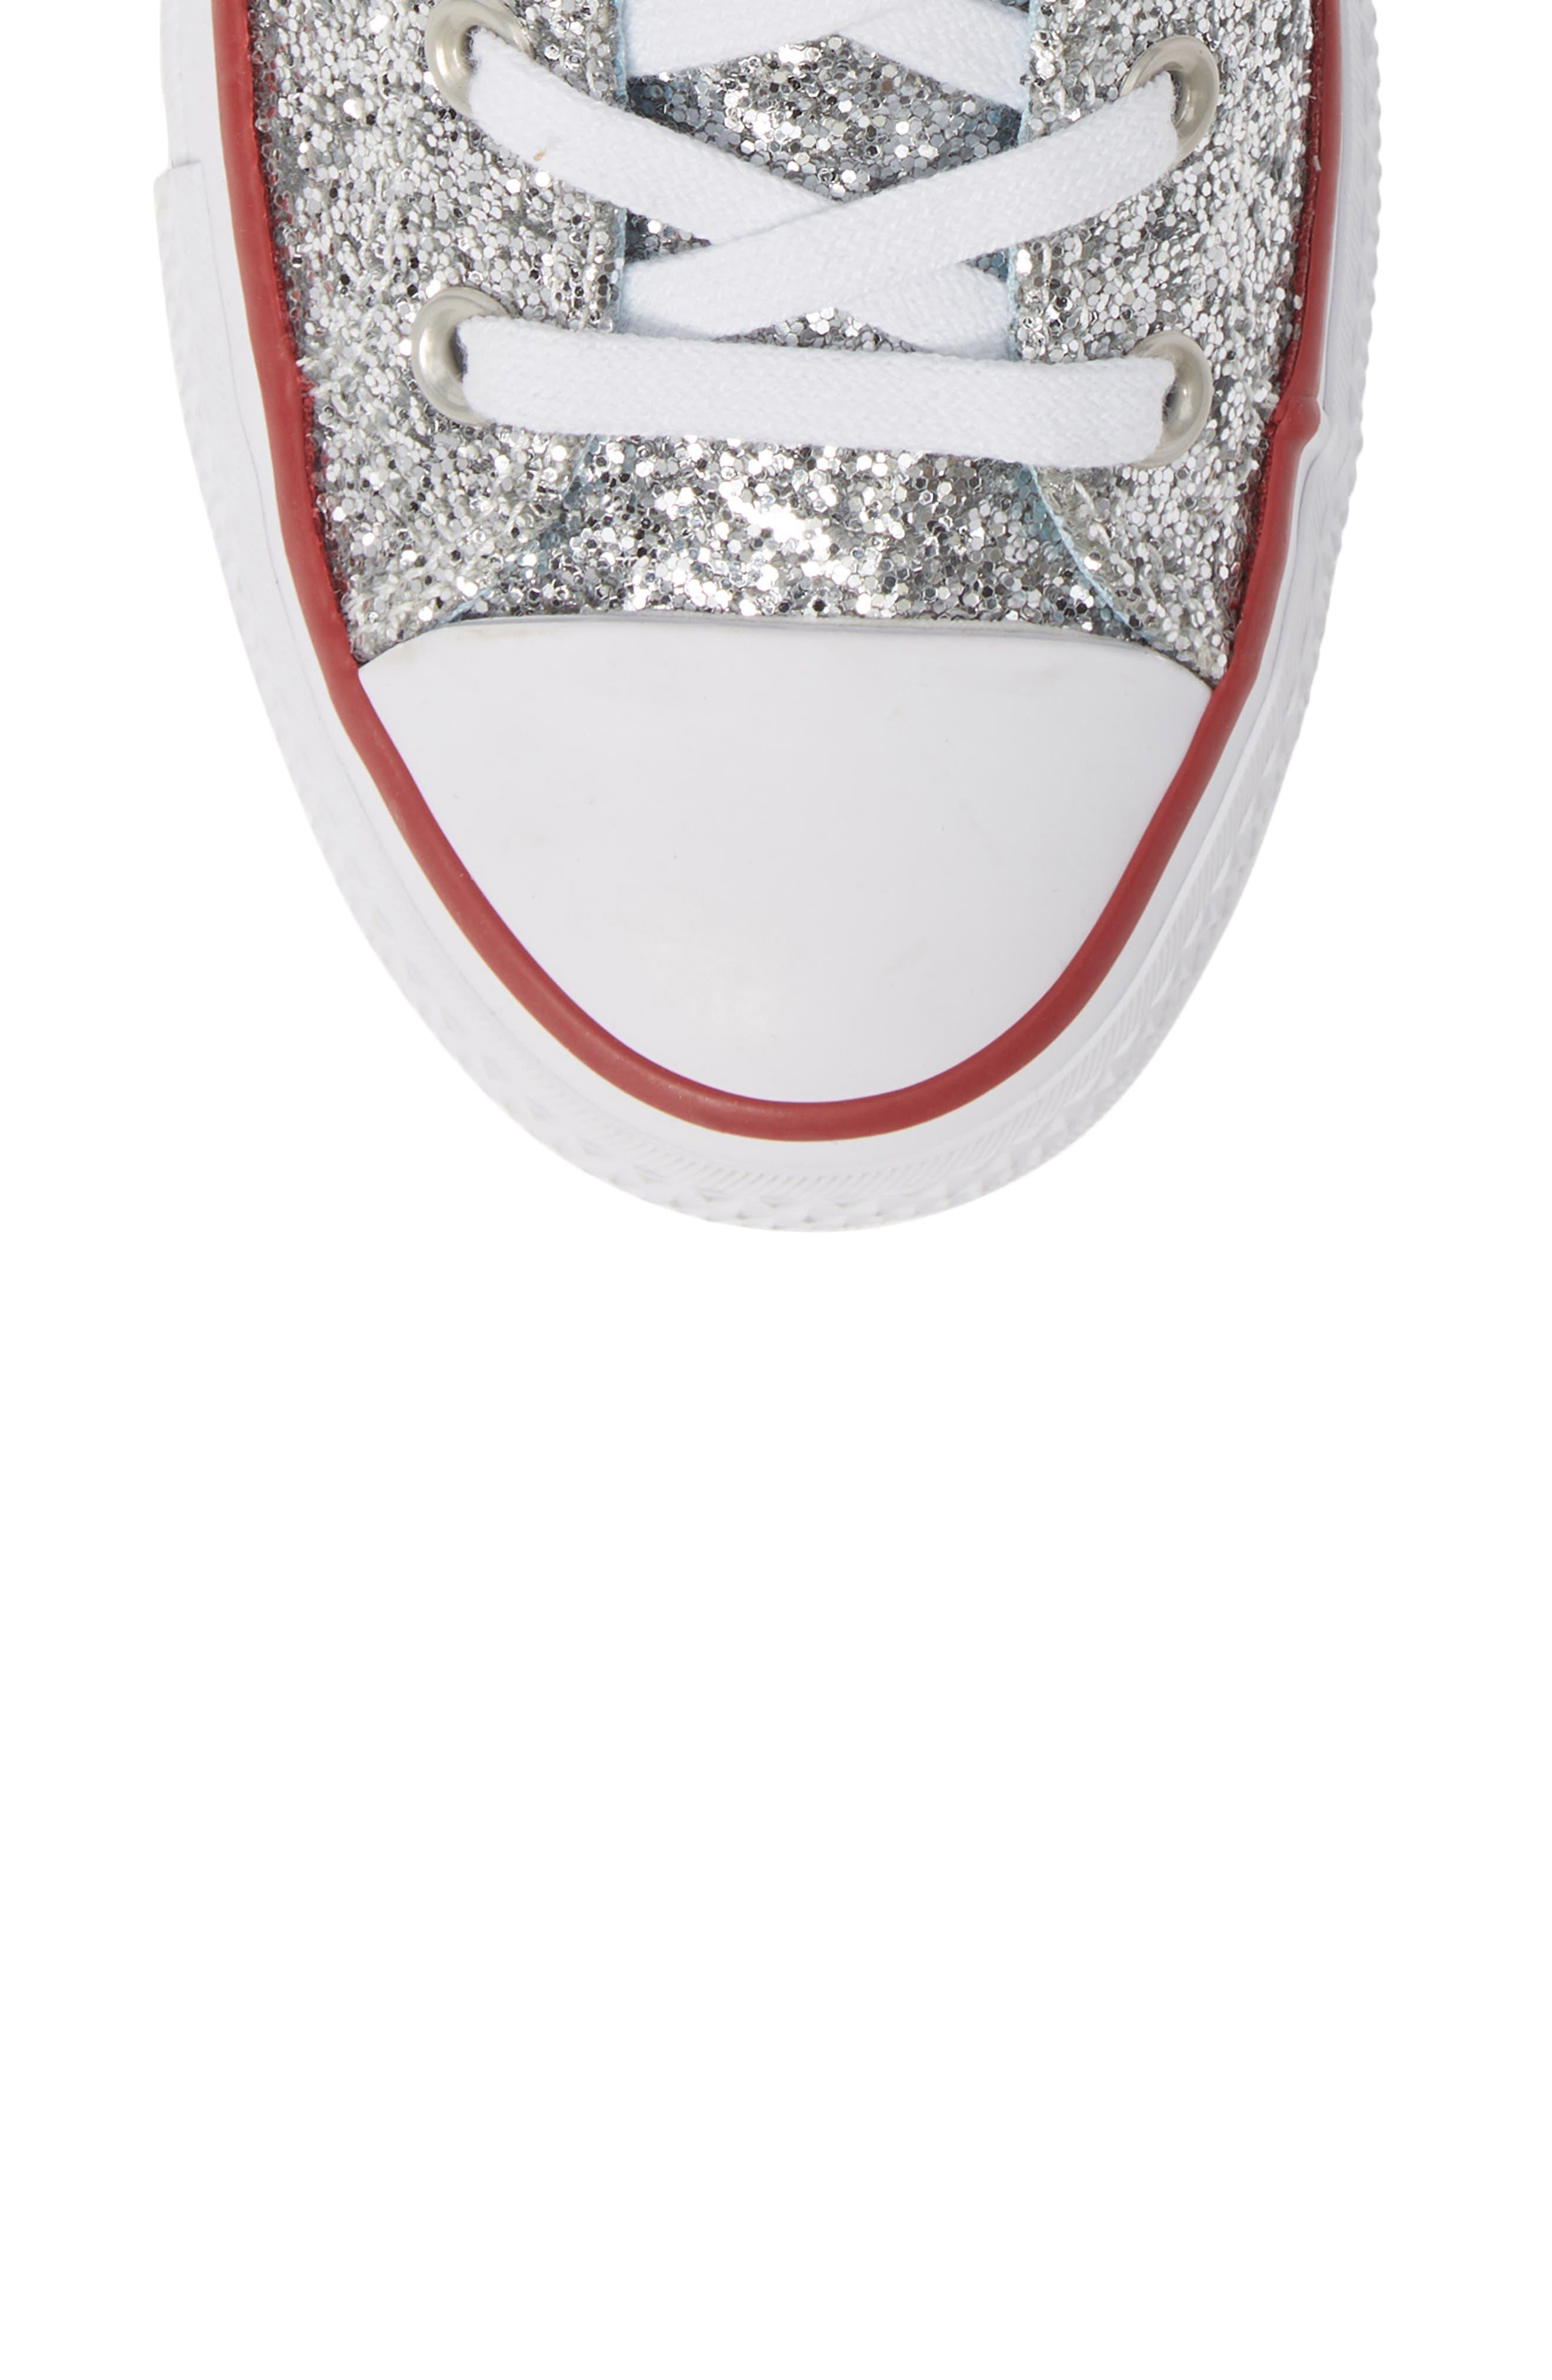 CONVERSE,                             x Chiara Ferragni 70 Hi One Star Glitter Platform Sneaker,                             Alternate thumbnail 5, color,                             040